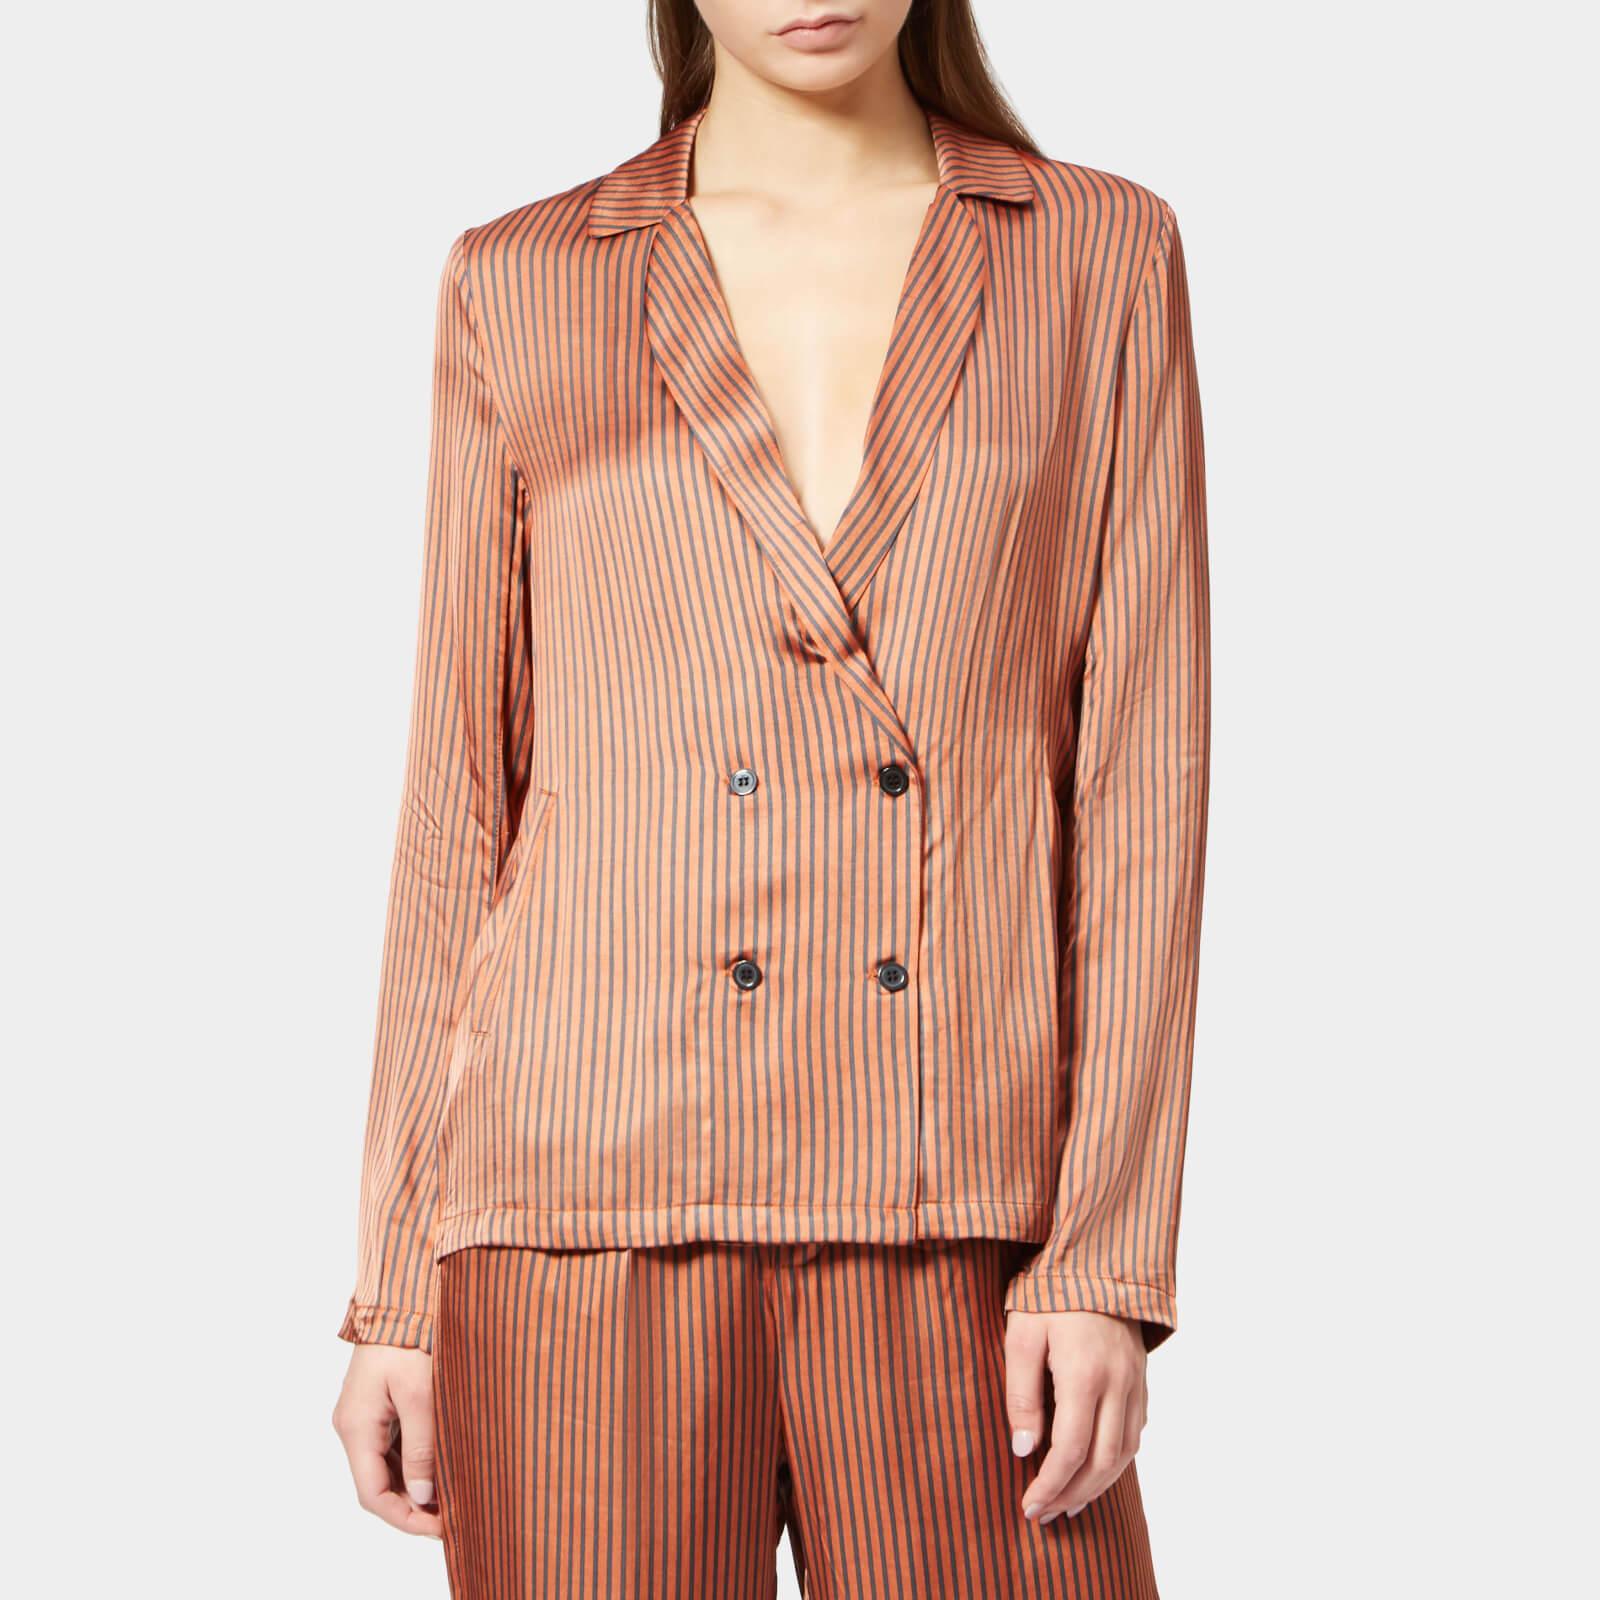 Gestuz Women's Veronica Shirt - Ginger Stripe - EU 36/UK 8 - Beige